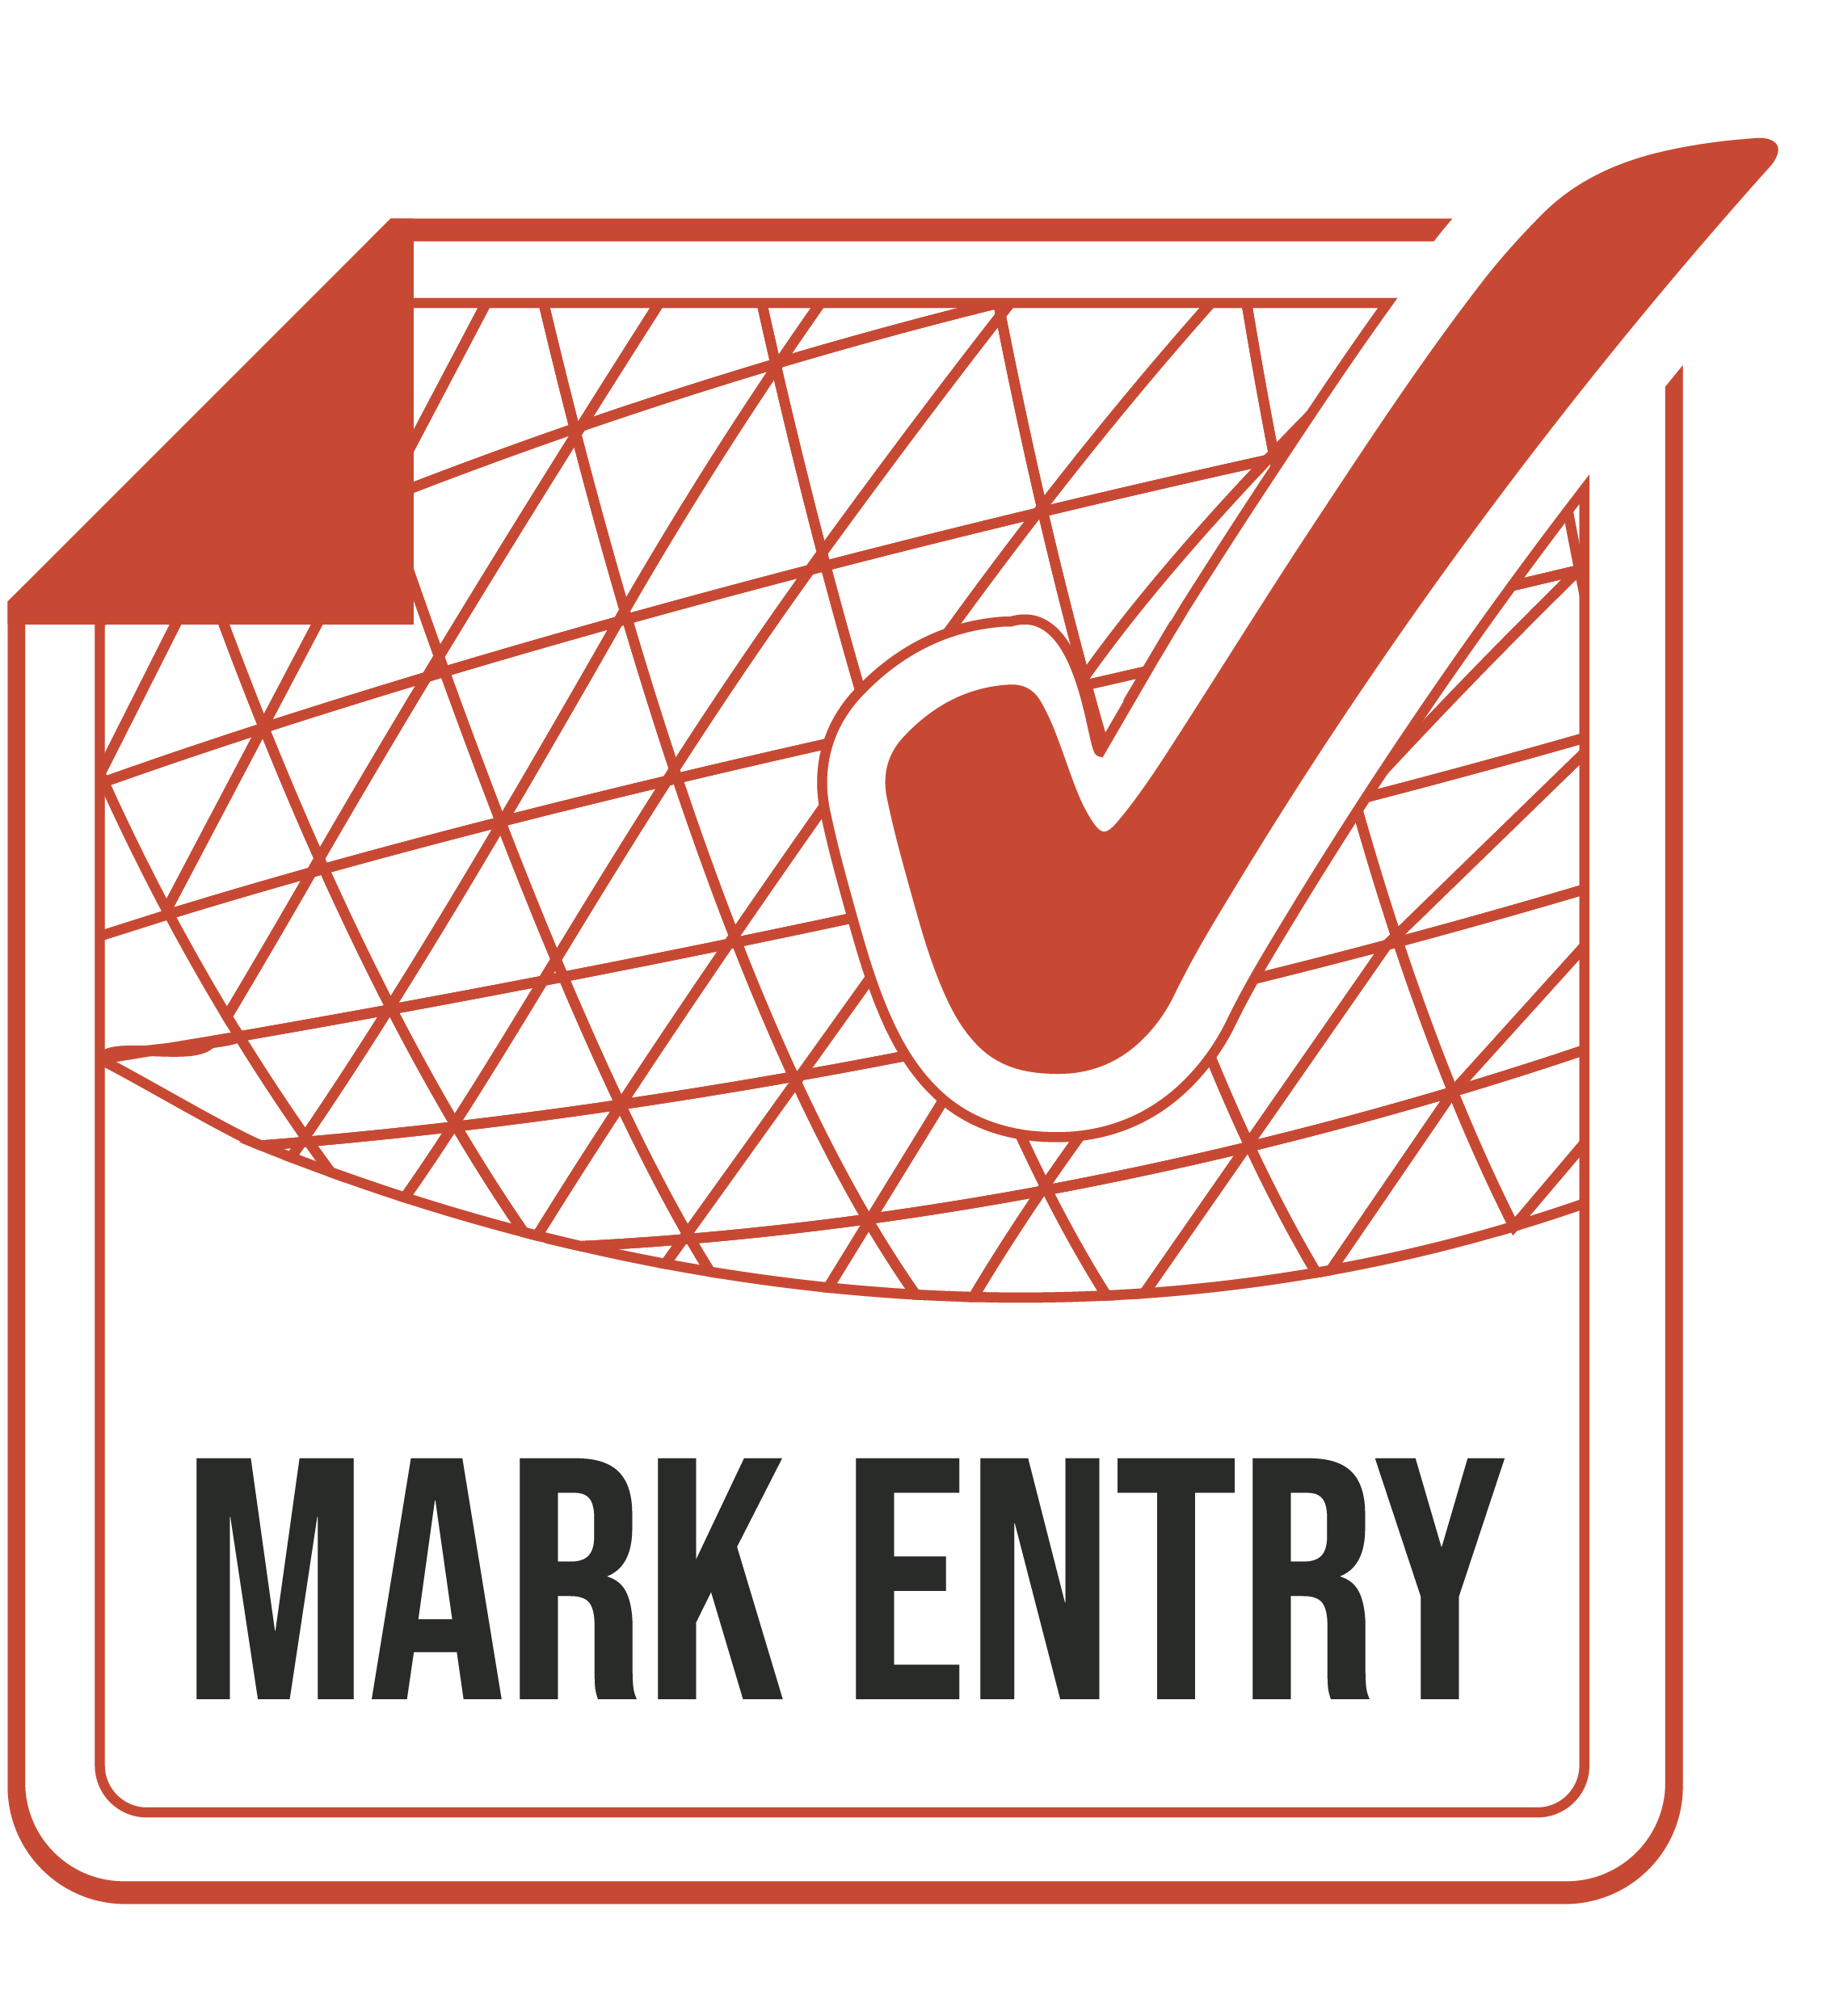 Mark Entry